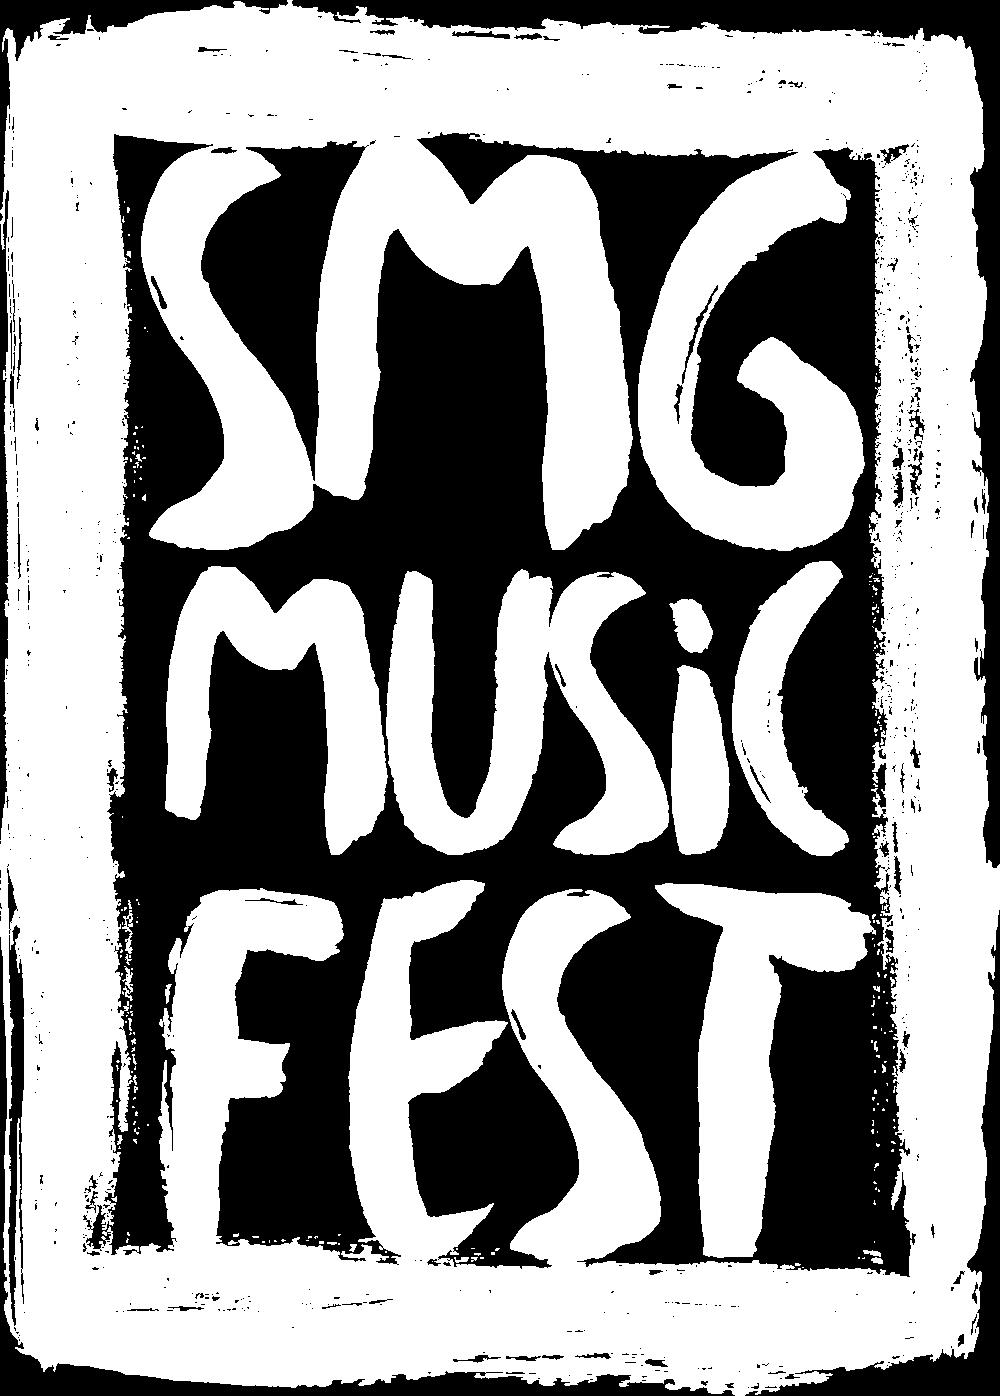 SMG Music Fest - alternative one night music event in Sart-Messire-Guillaume (Brabant wallon)